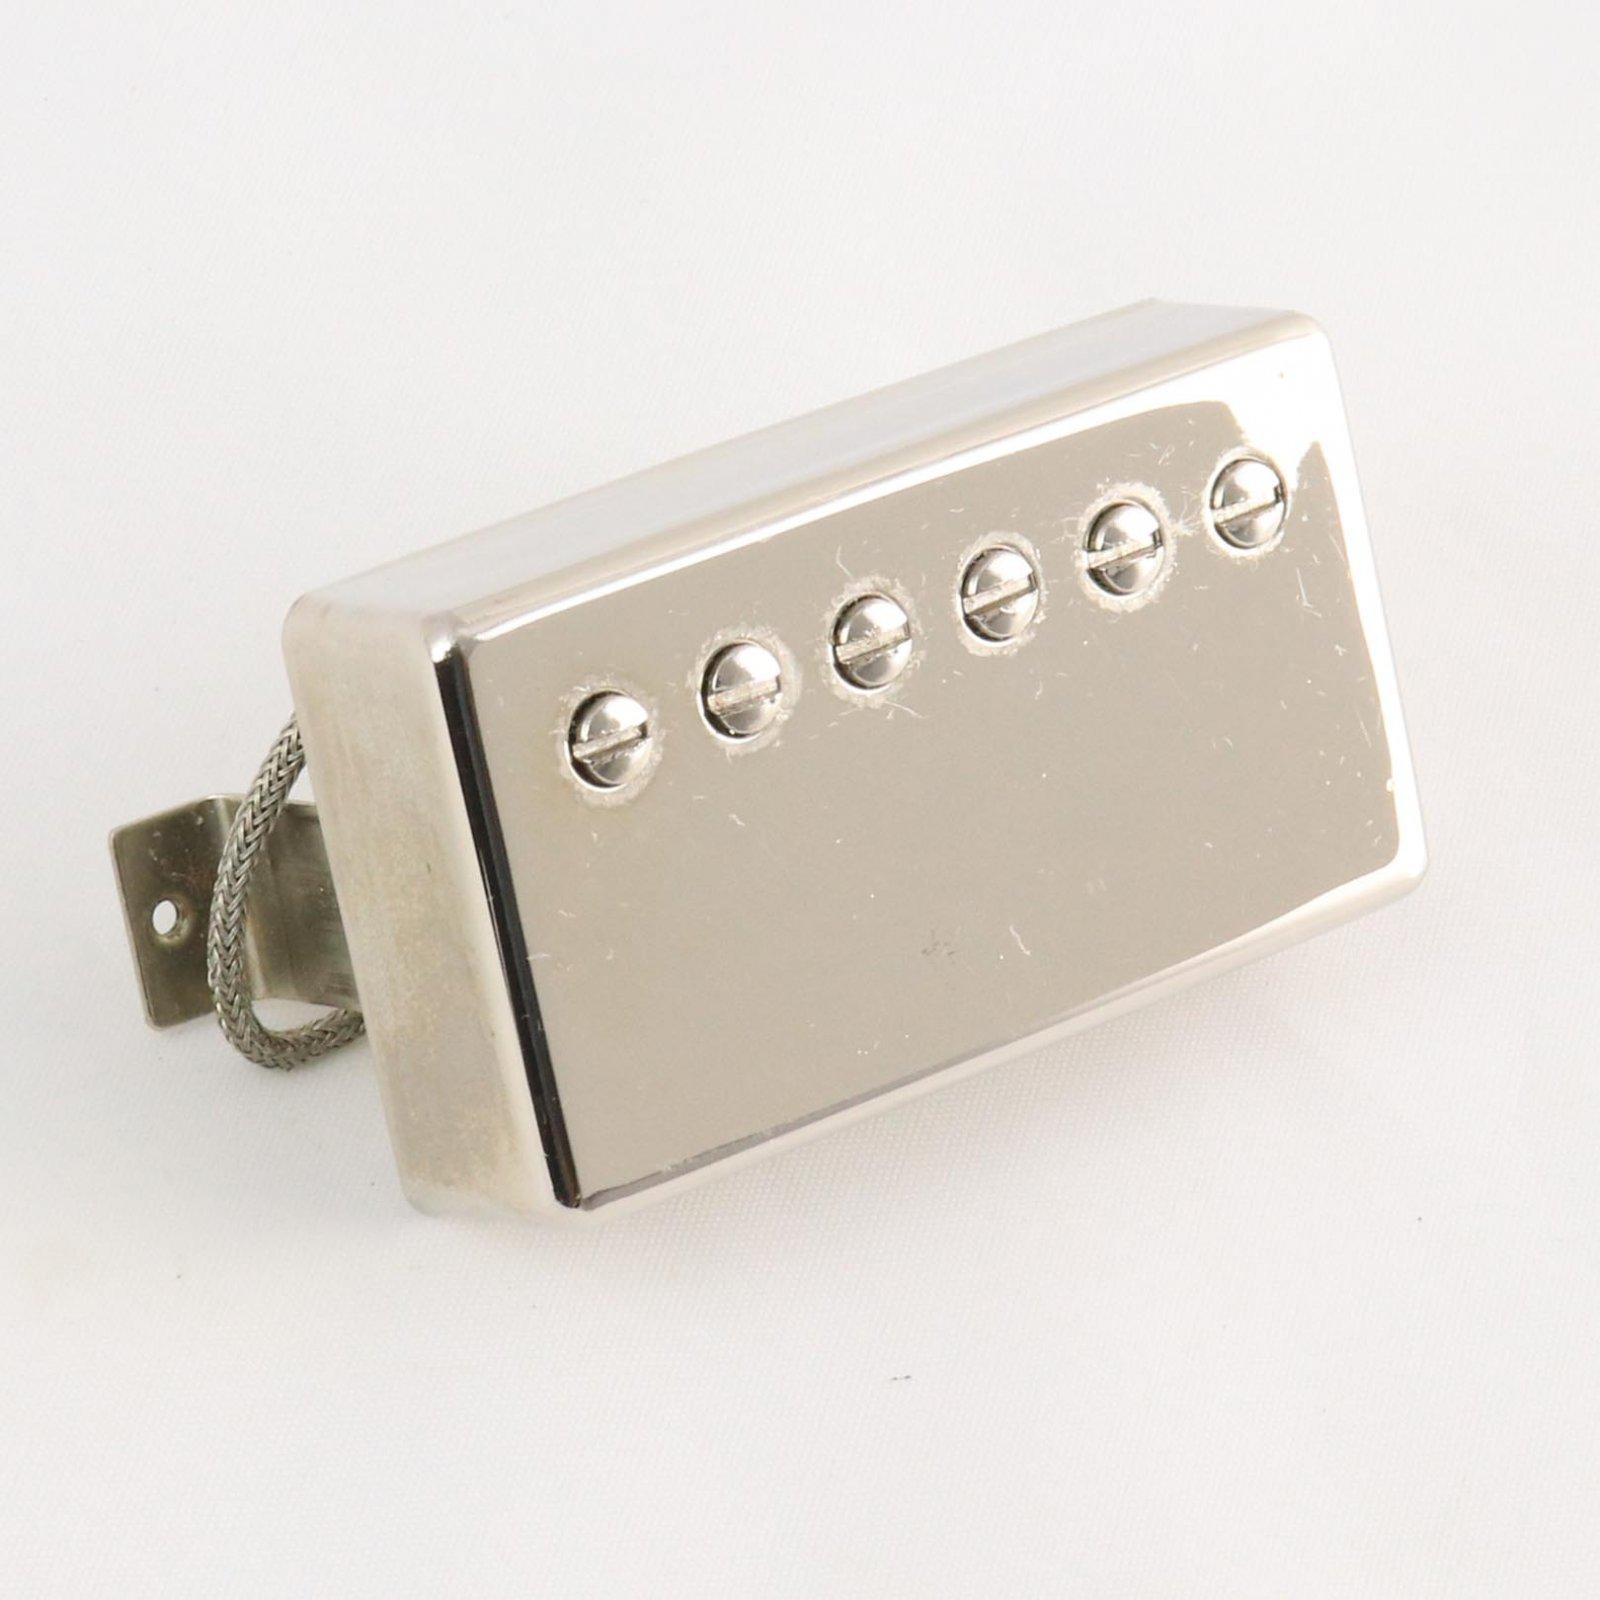 Epiphone Humbucker - Nickel